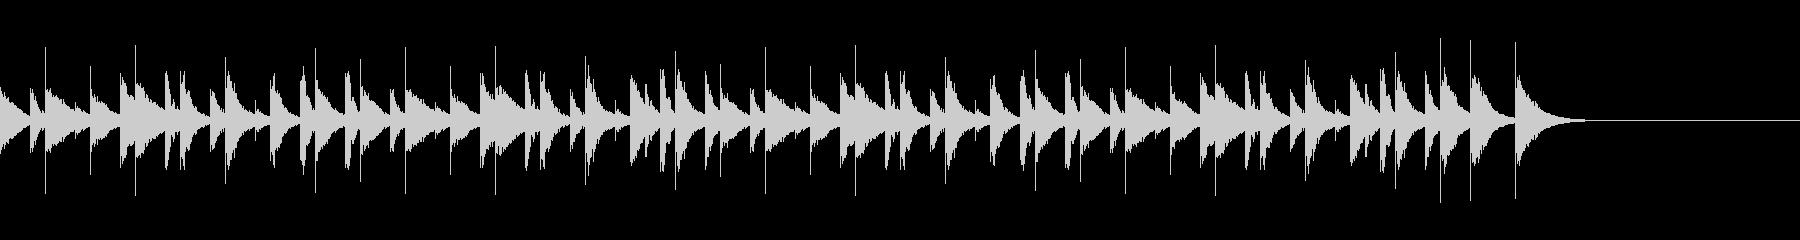 CM 木琴の陽気でコミカルなBGMの未再生の波形